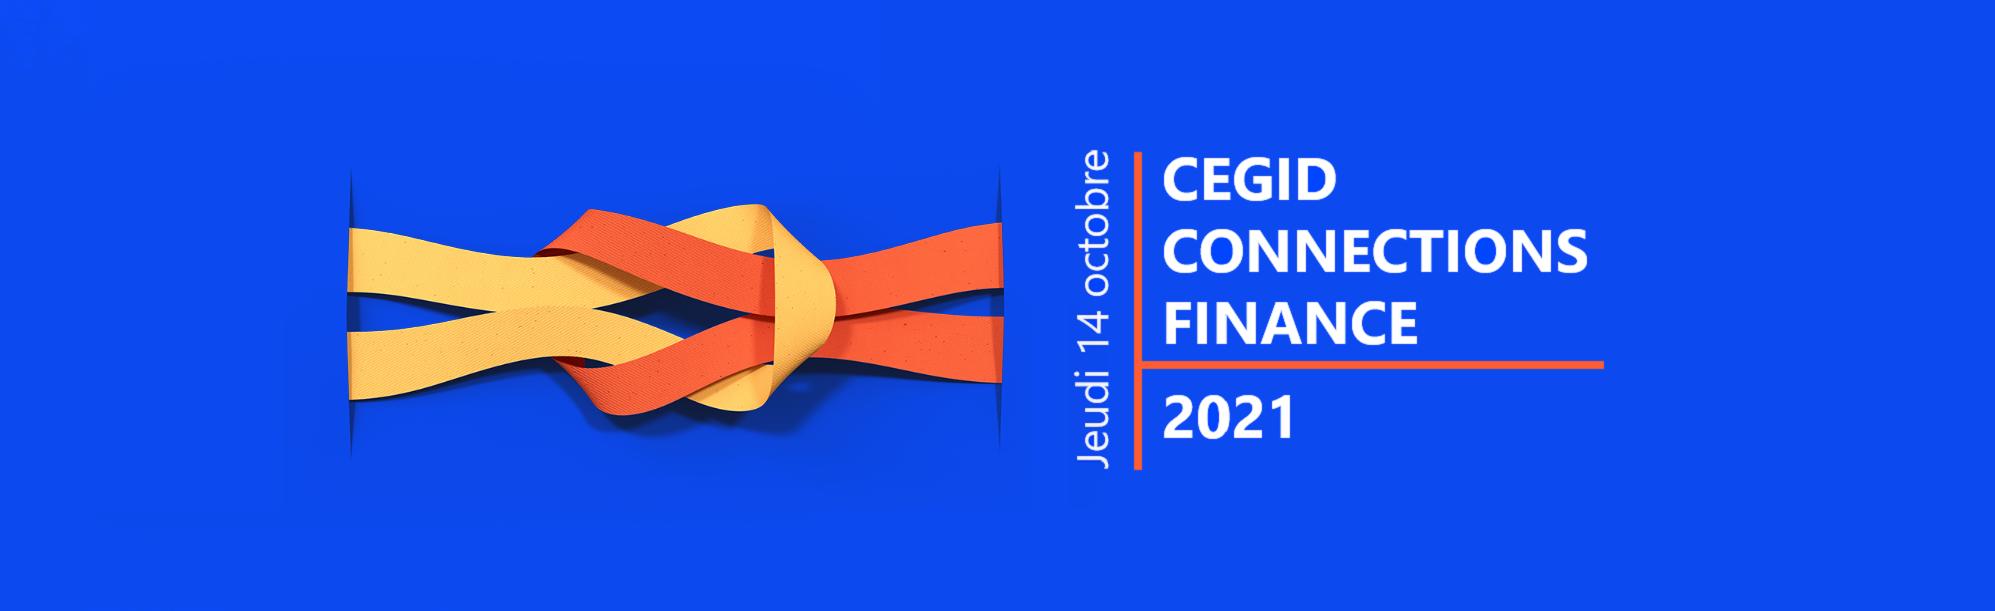 Cegid Connections Finance